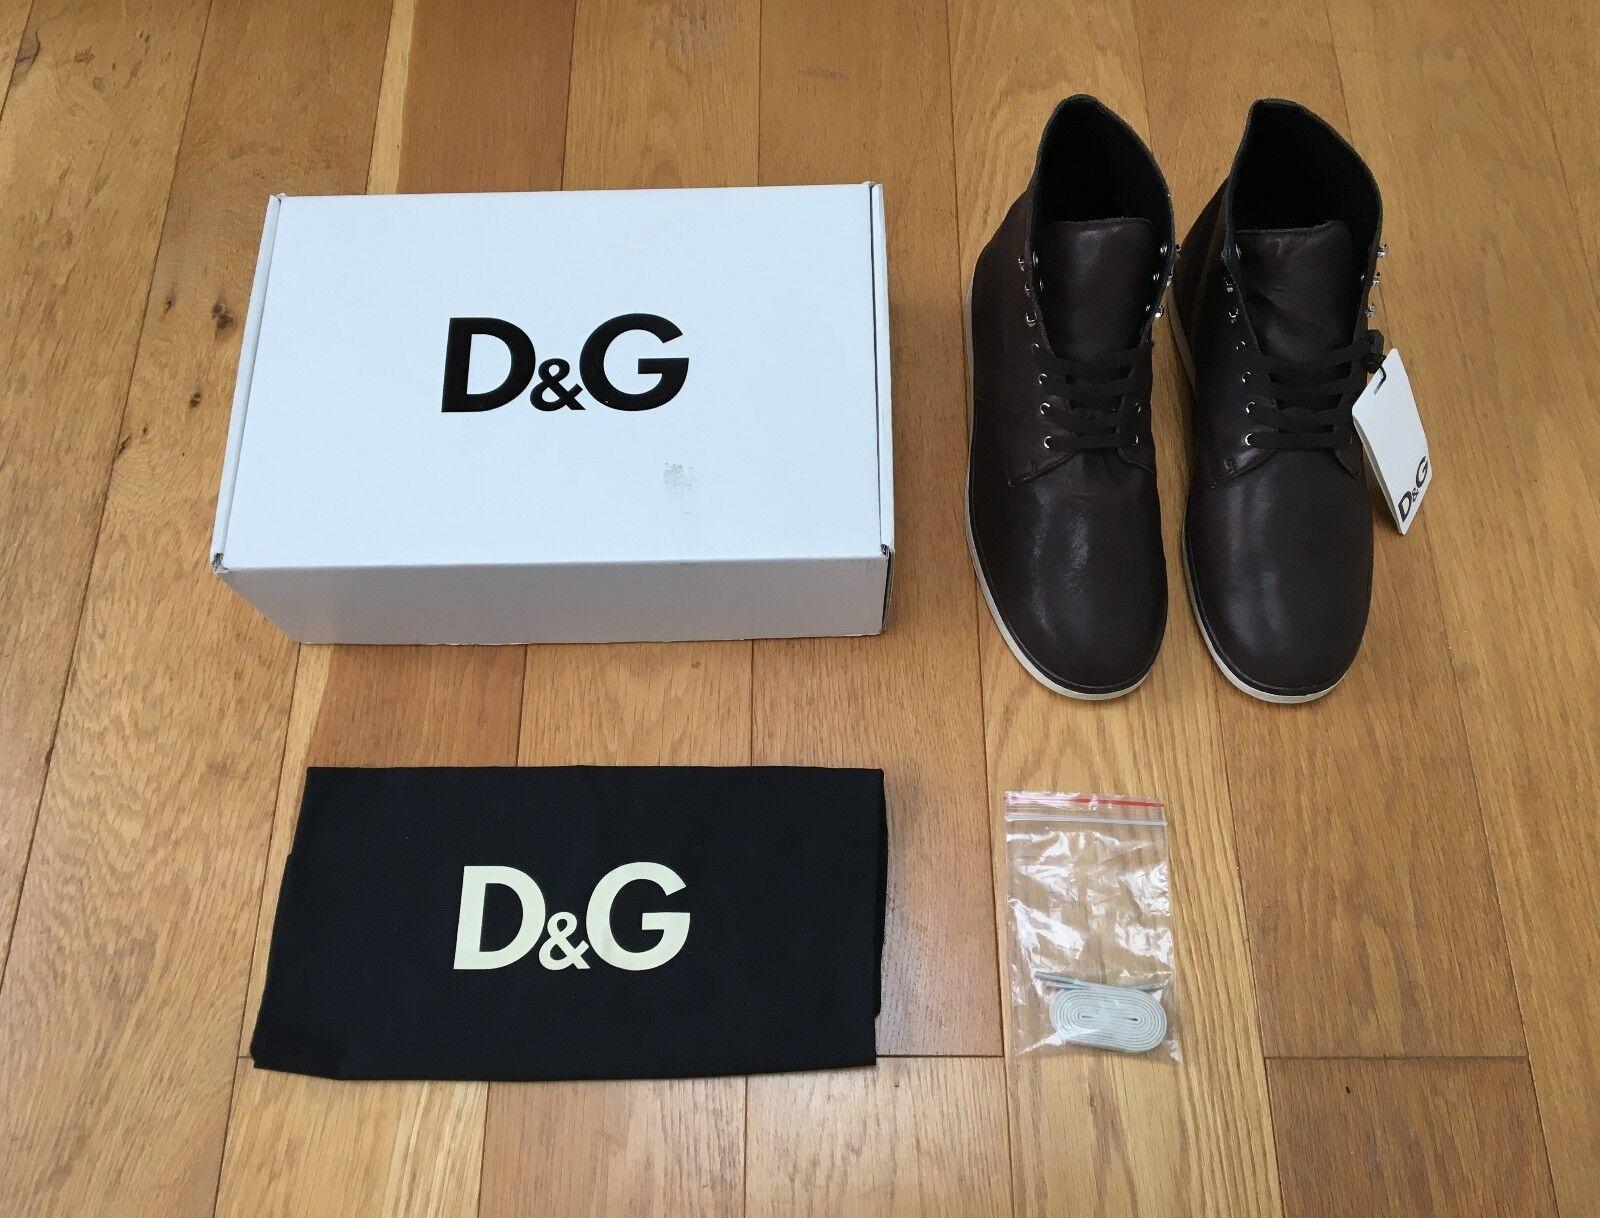 Dolce & Gabbana-d&g - cuero Boots/sneakers, 43 (42), marrón-NUEVO, EMBALAJE ORIGINAL!!!